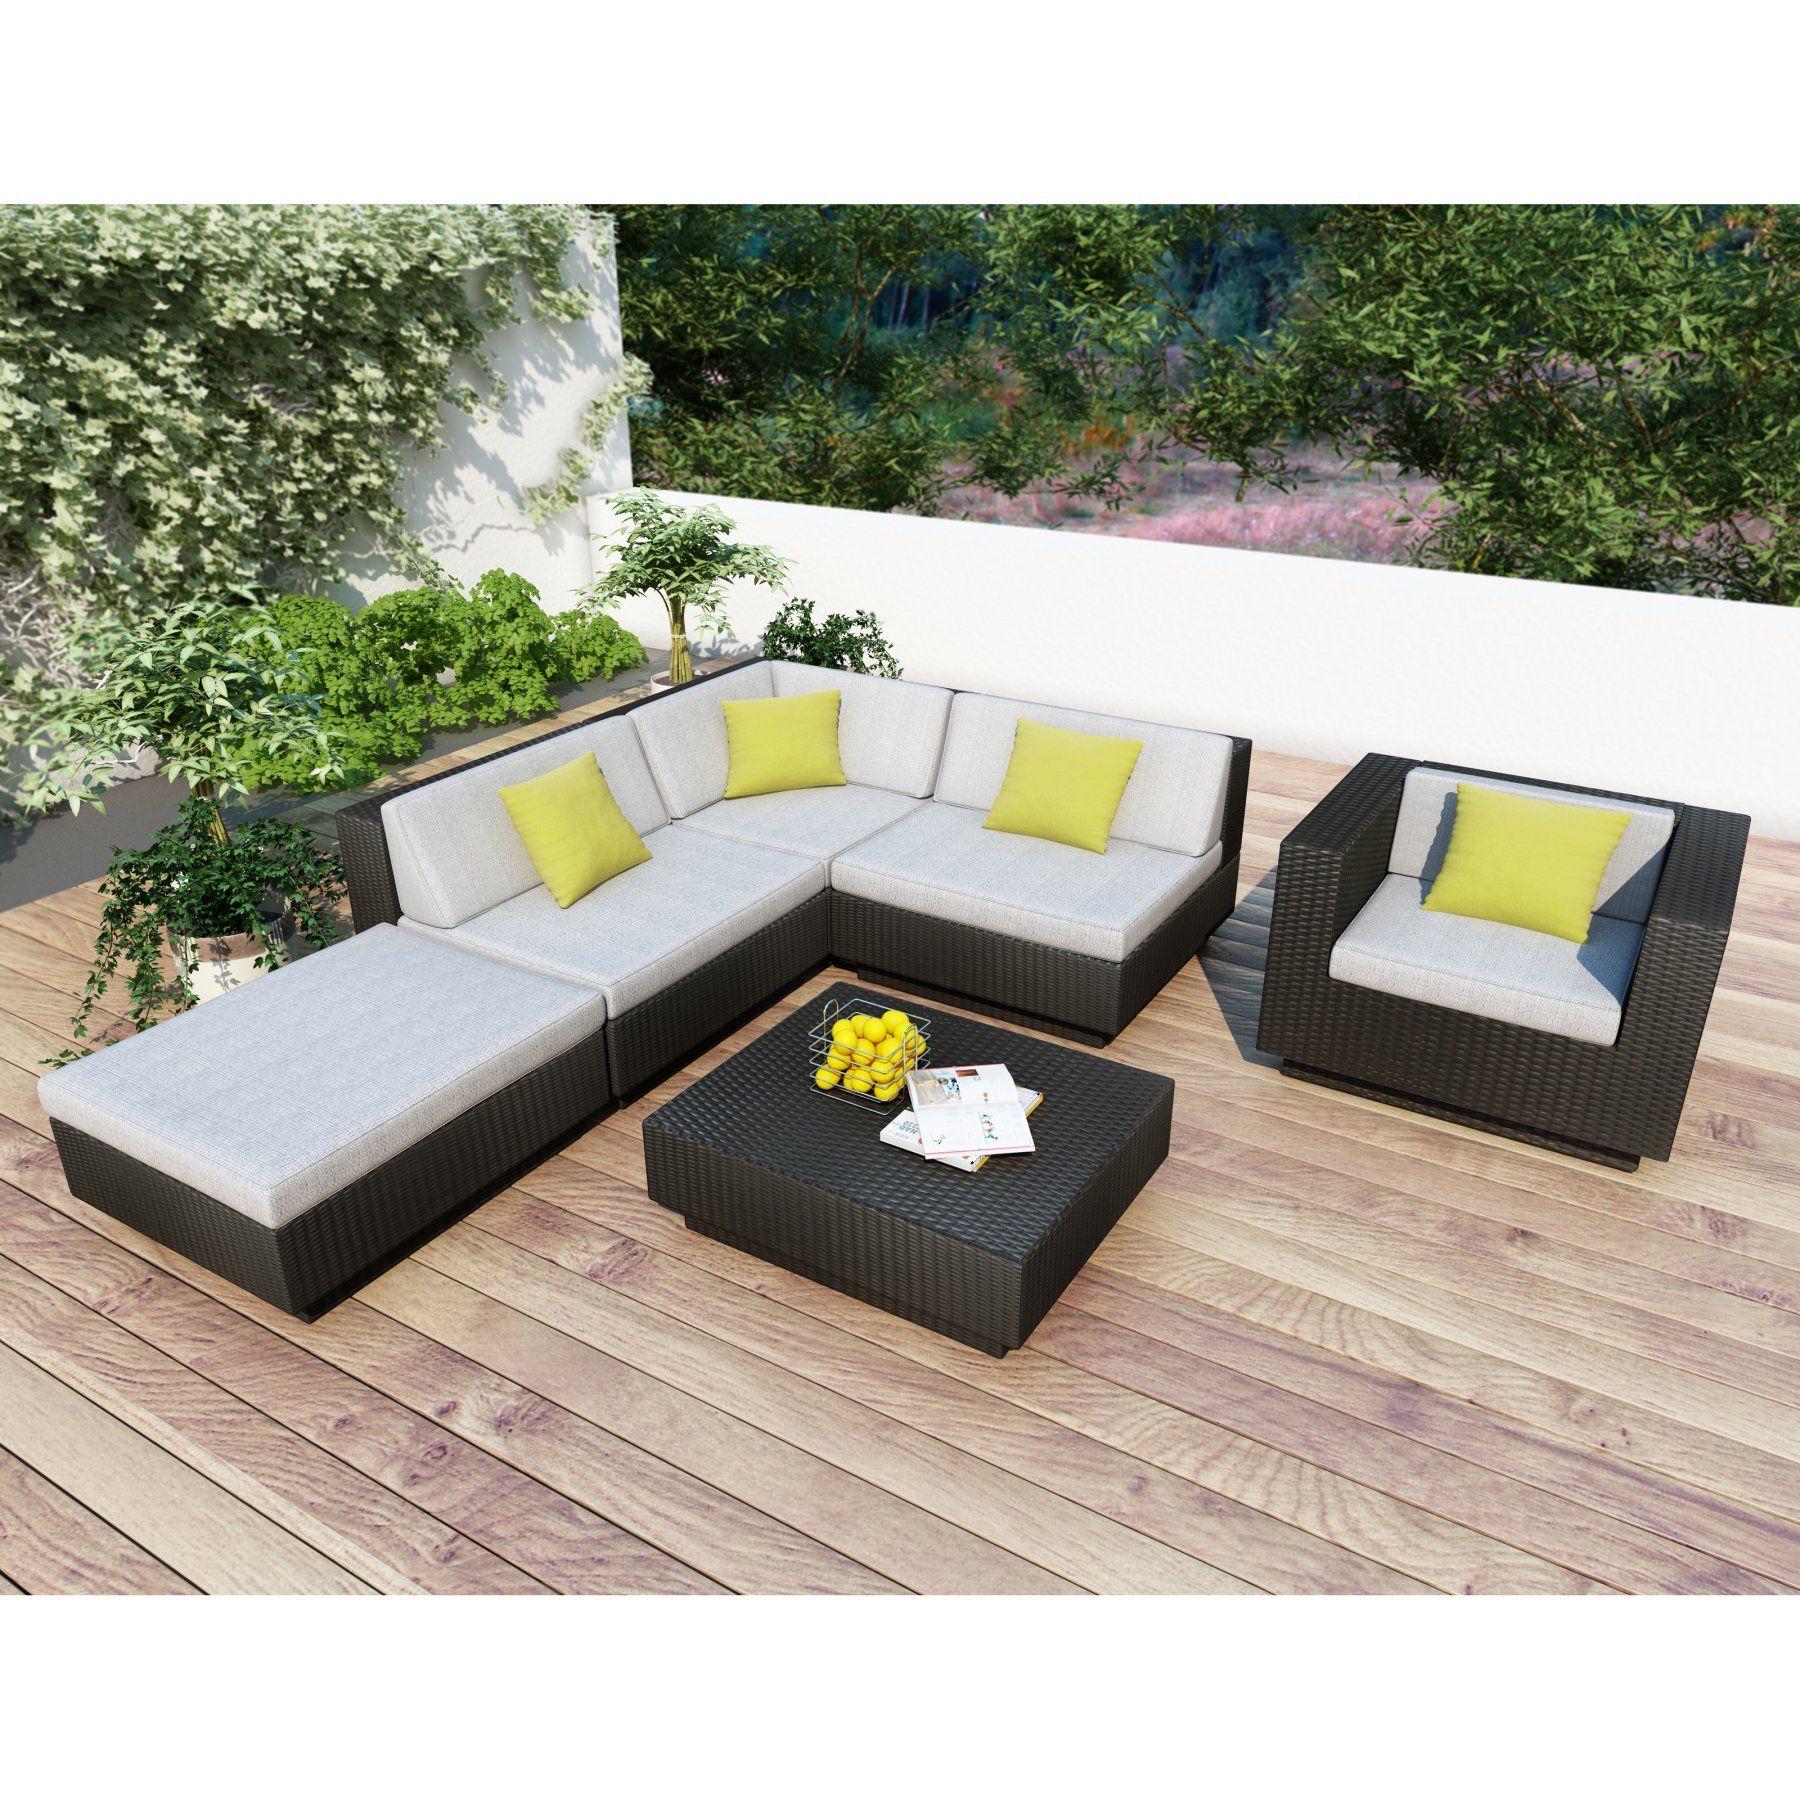 Outdoor CorLiving Park Terrace Textured Black Sectional Conversation Set - PPT-303-Z